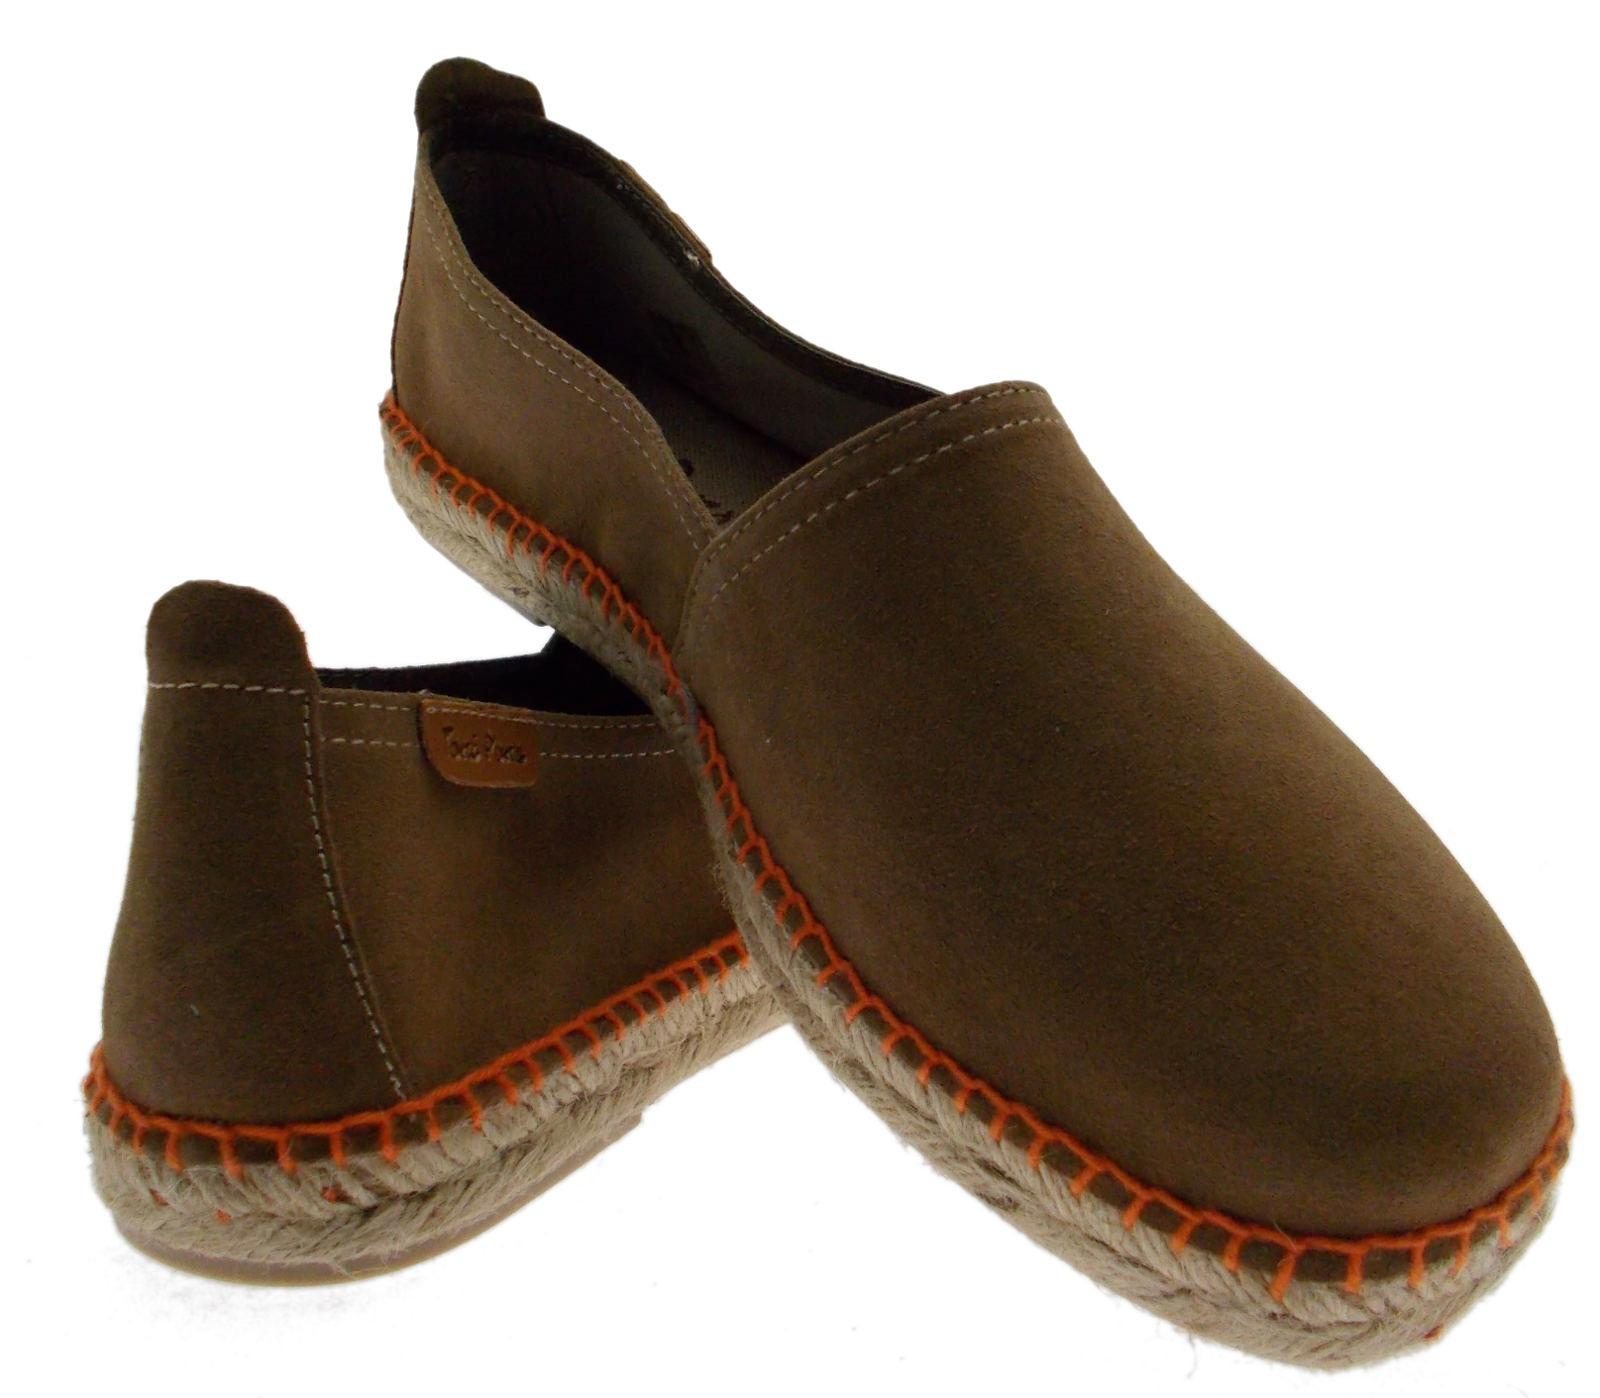 Espadrillas  mocassino  art pantofola camoscio taupe art  DAKAR Toni Pons 7eae45